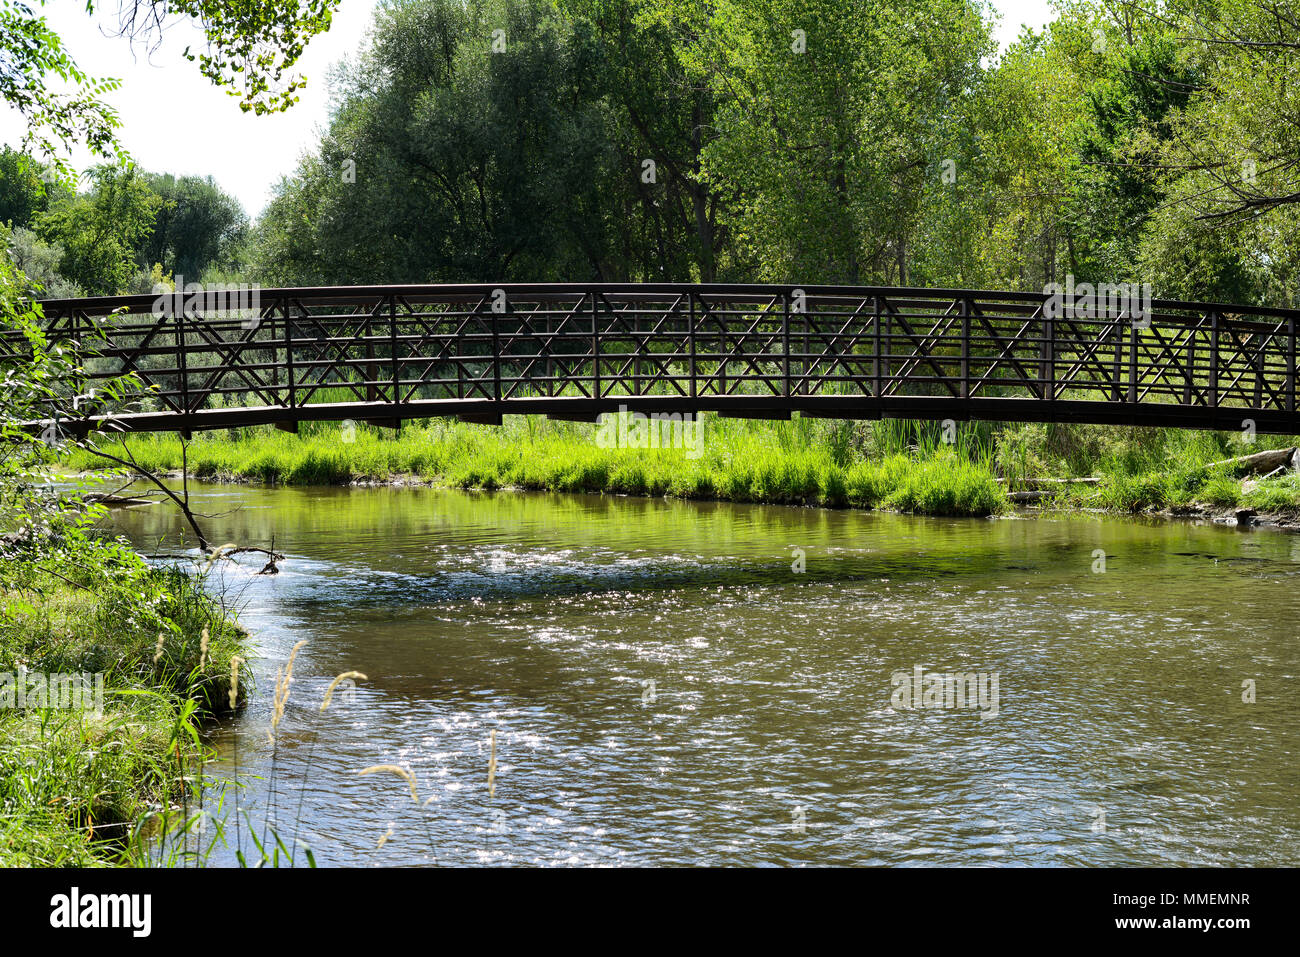 Summer Creek - A iron trail bridge over a full summer creek. Bear Creek, Denver-Lakewood, Colorado, USA. - Stock Image